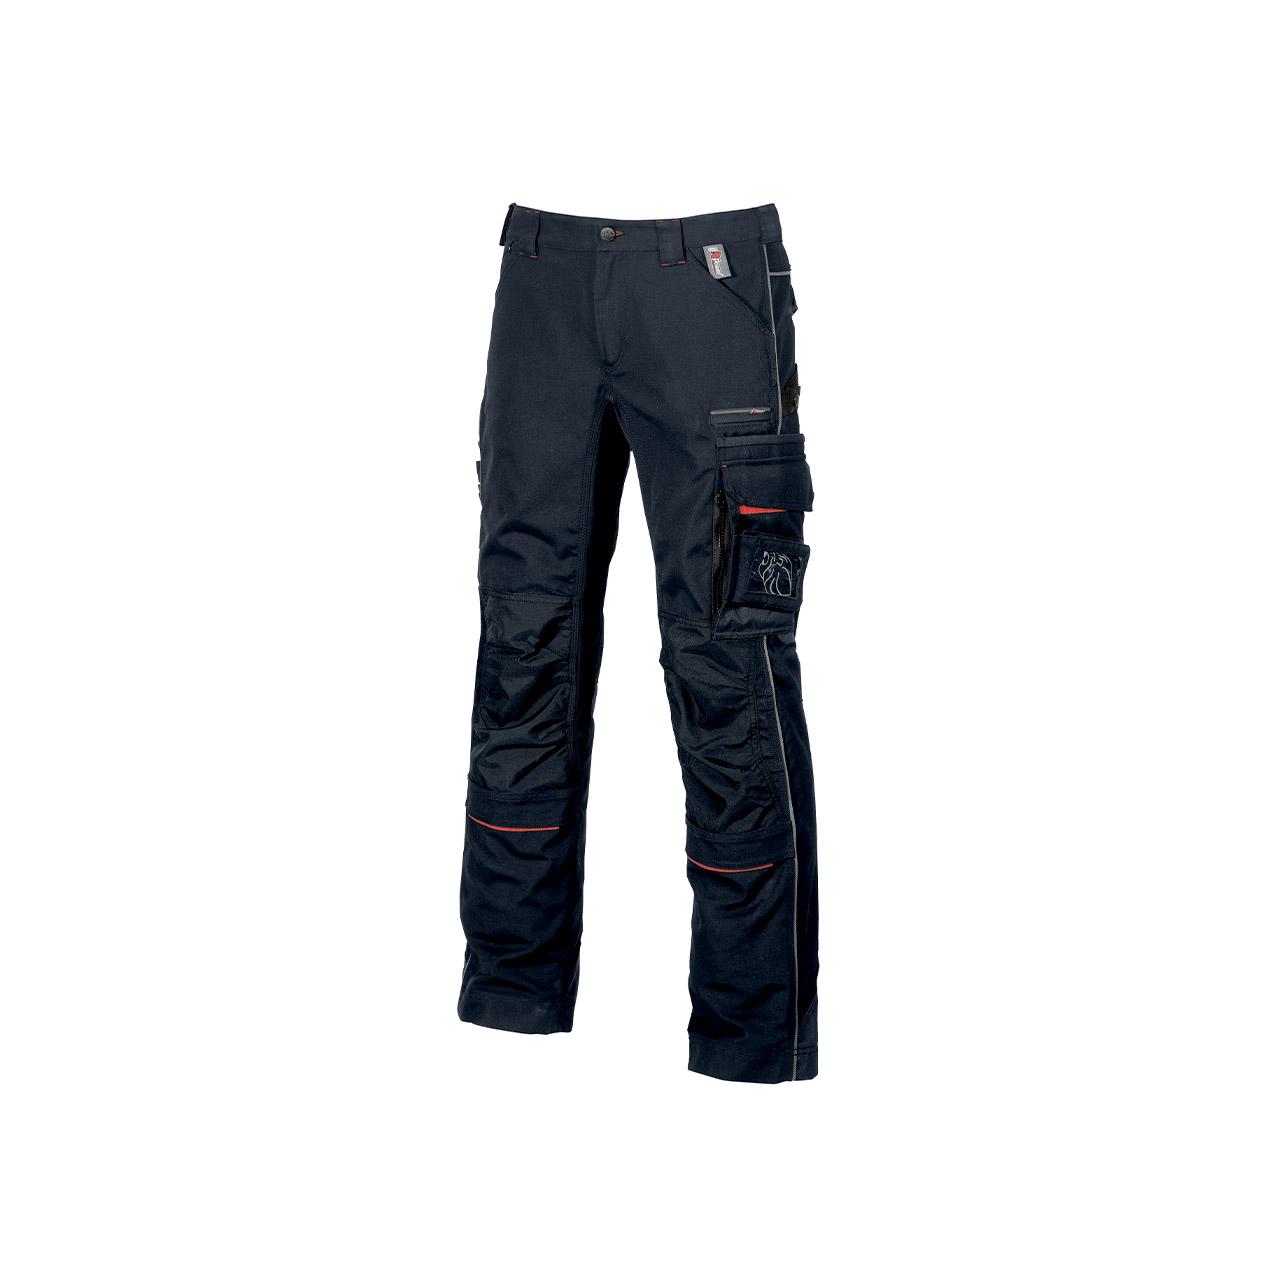 Pantalone Lungo Invernale UPower Modello Drift